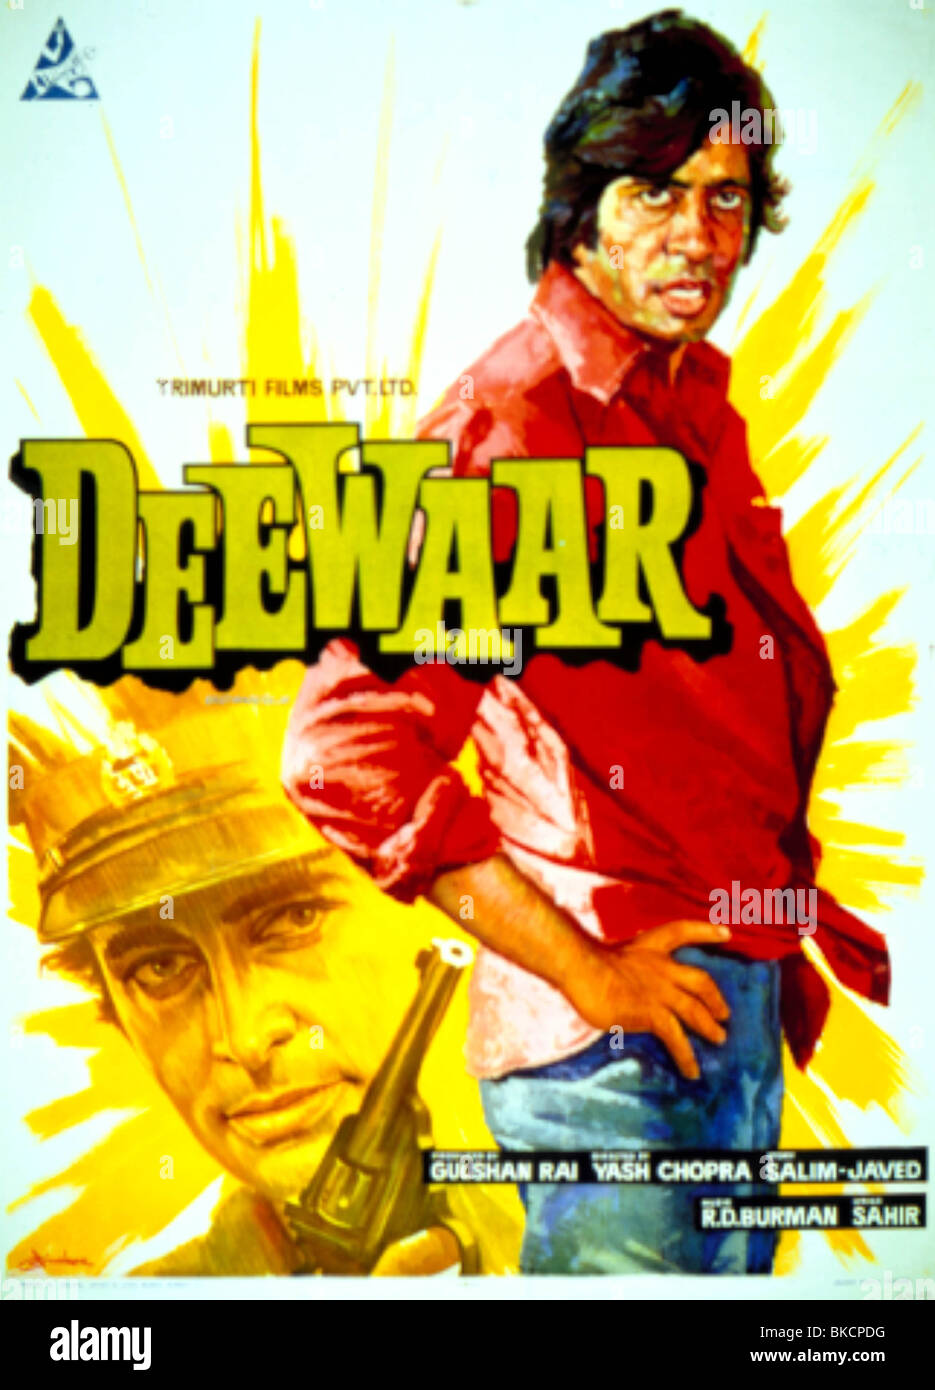 DEEWAAR (1975) DIE WAND (ALT) PLAKAT BOLLYWOOD DEWR 001OS Stockbild